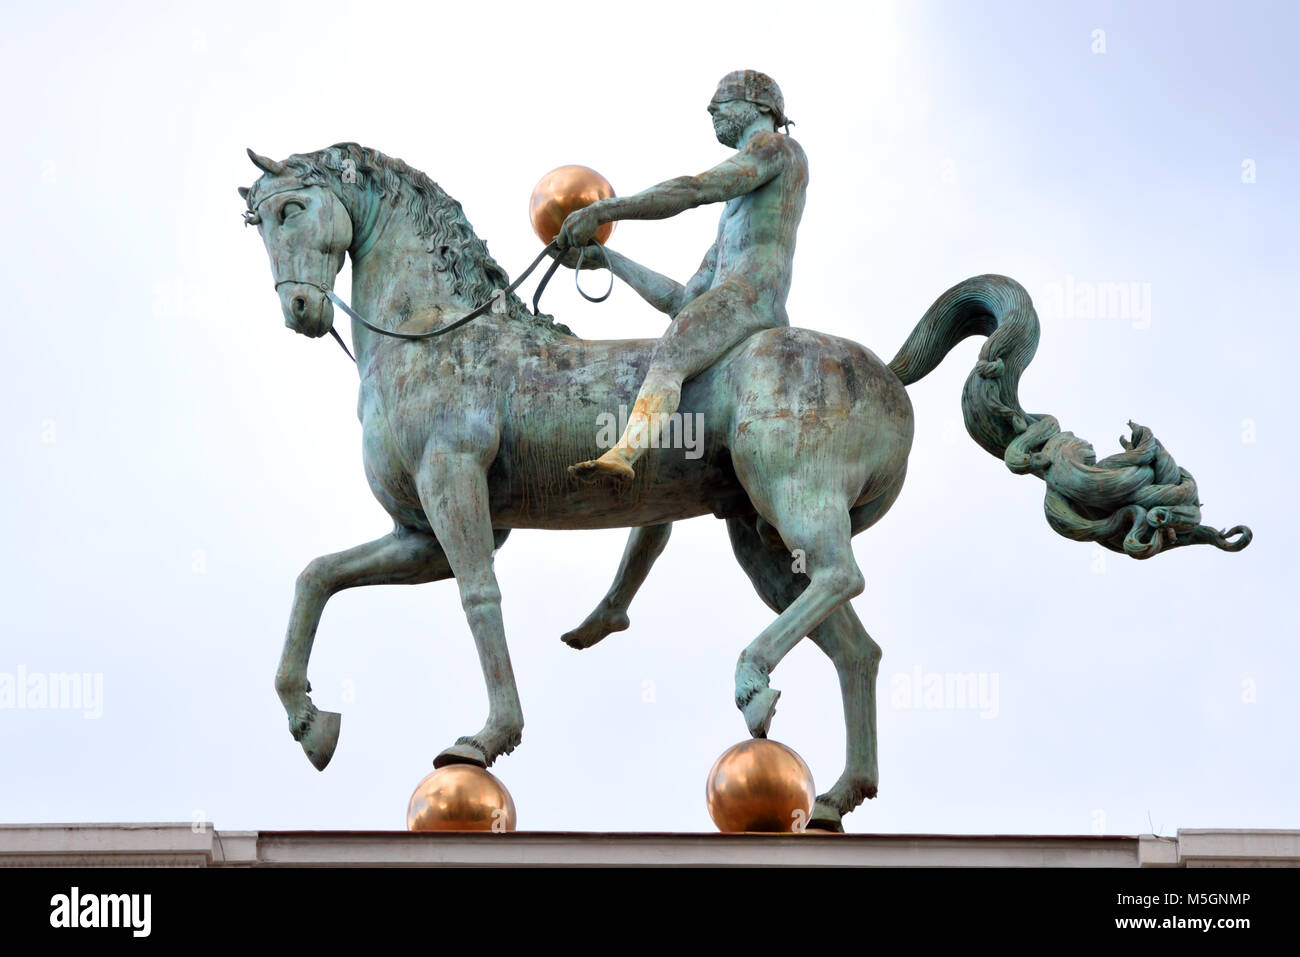 Equestrian statue atop the Ayuntamiento (City Hall) building in Plaza del Carmen, City of Granada, Province of Granada - Stock Image